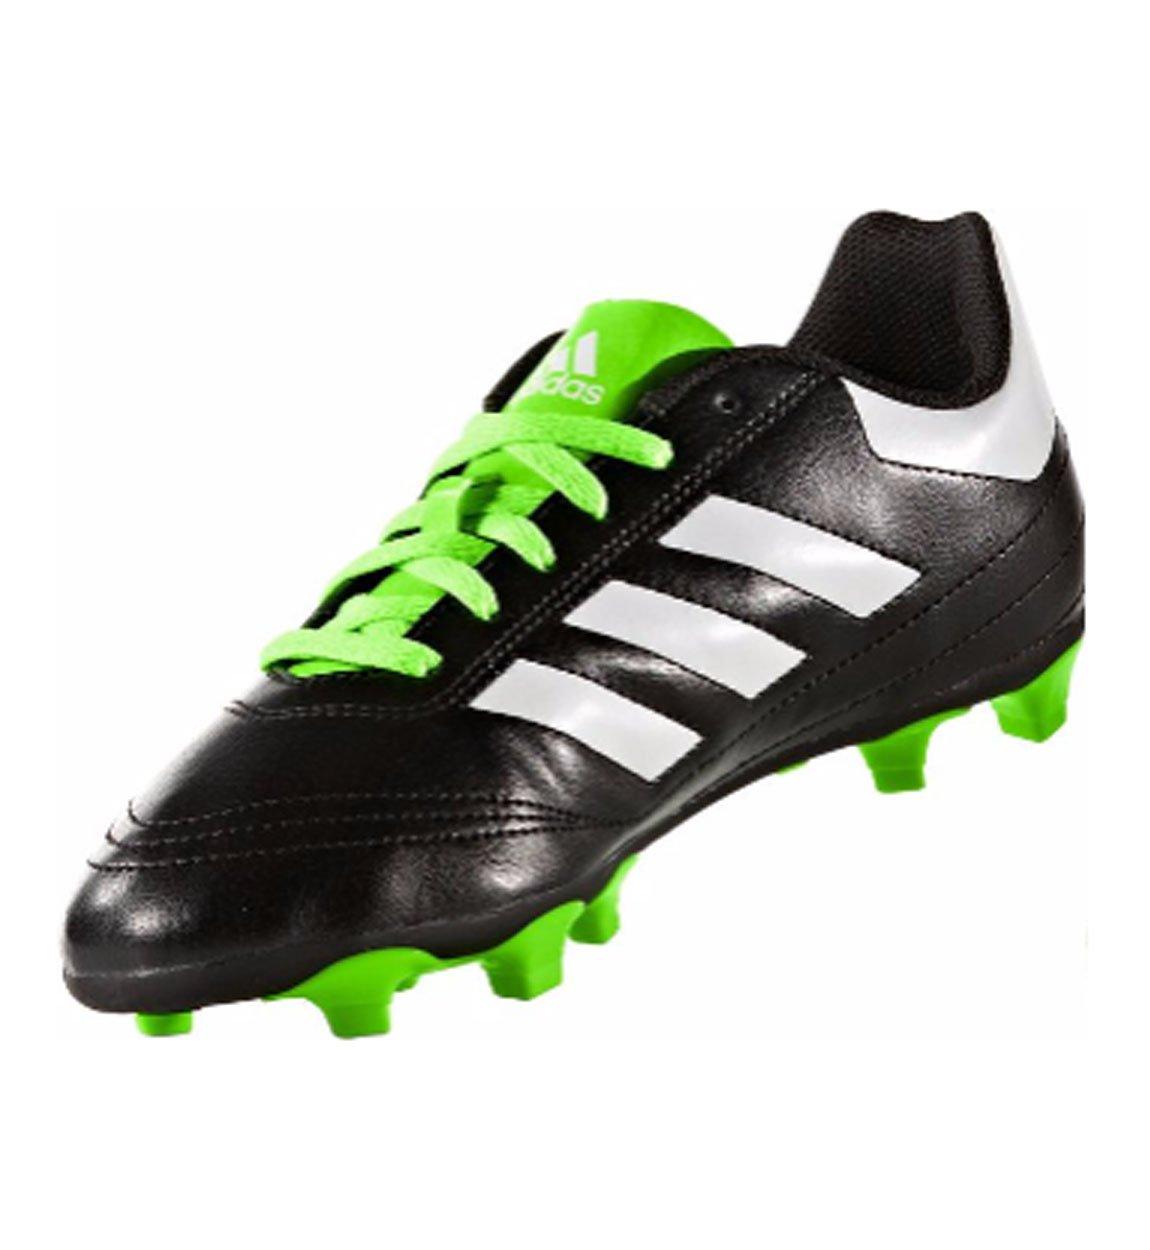 adidas Performance Kids' Goletto VI J Firm Ground Soccer Cleats, Black/White/Sgreen, 12 Medium US Little Kid